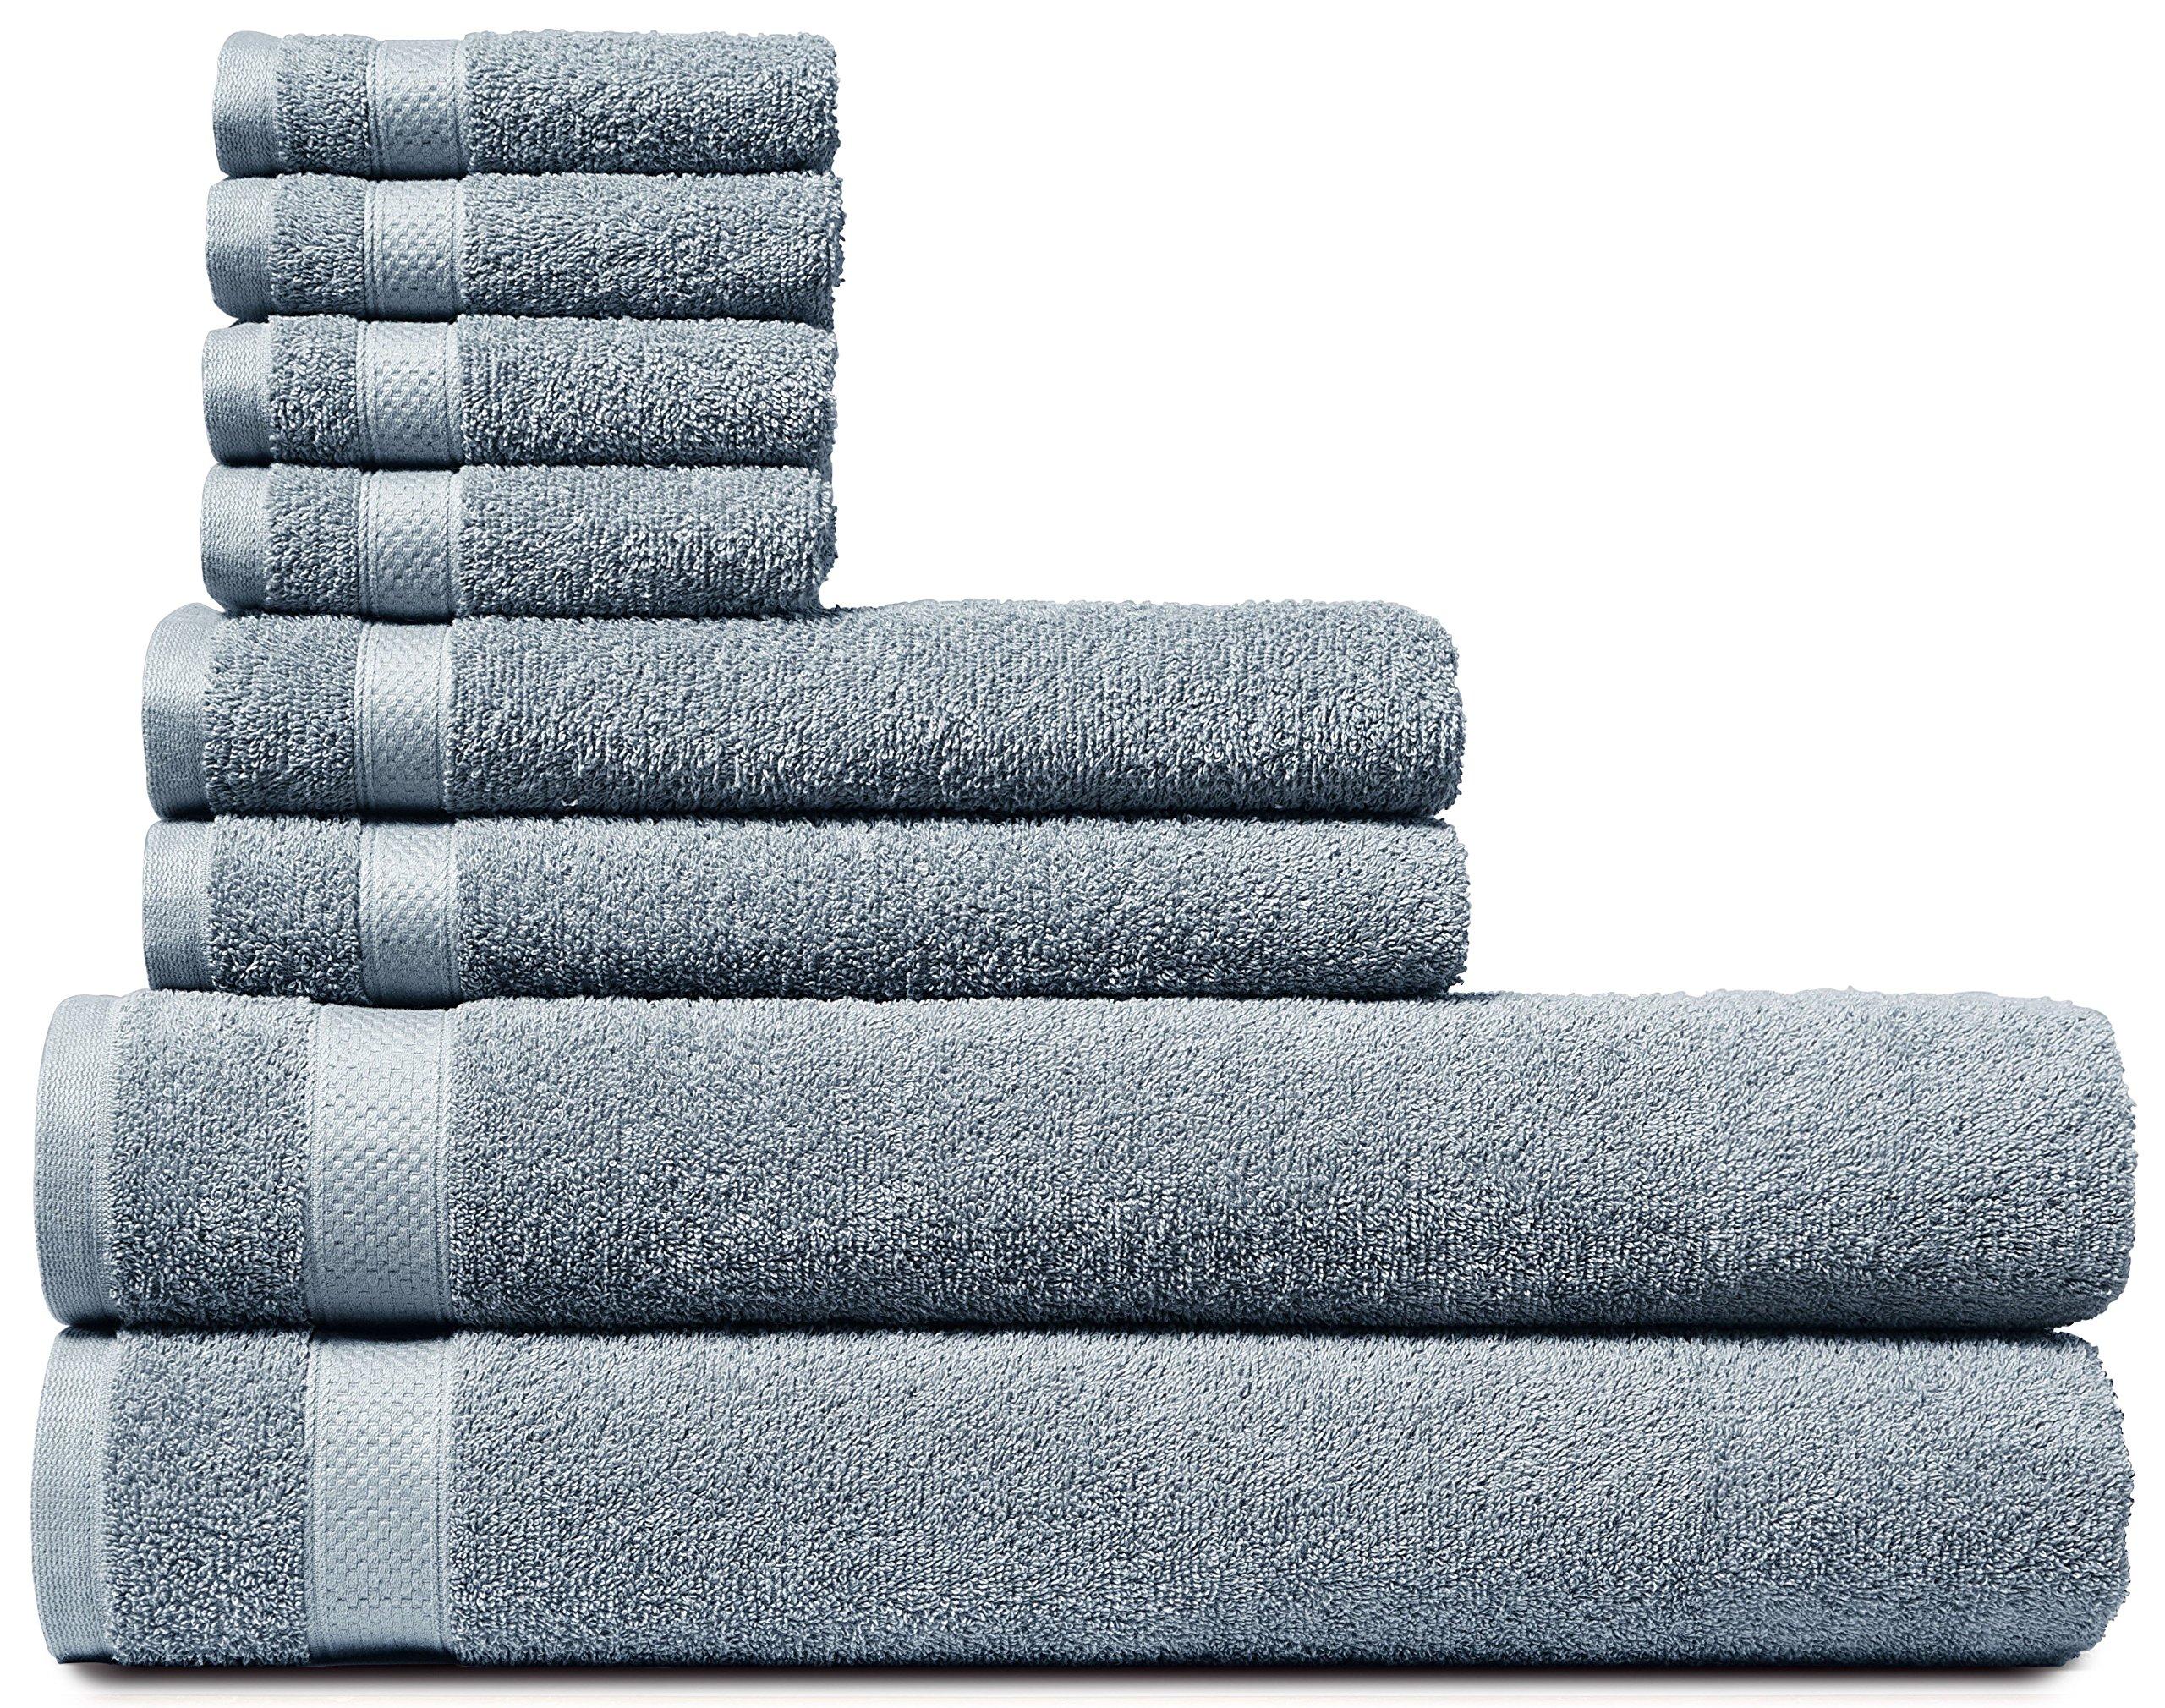 Welhome Cotton 8 Piece Towel Set; 2 Bath Towels, 2 Hand Towels And 4 Washcloths, Machine Washable, Super Soft Neutral Grey